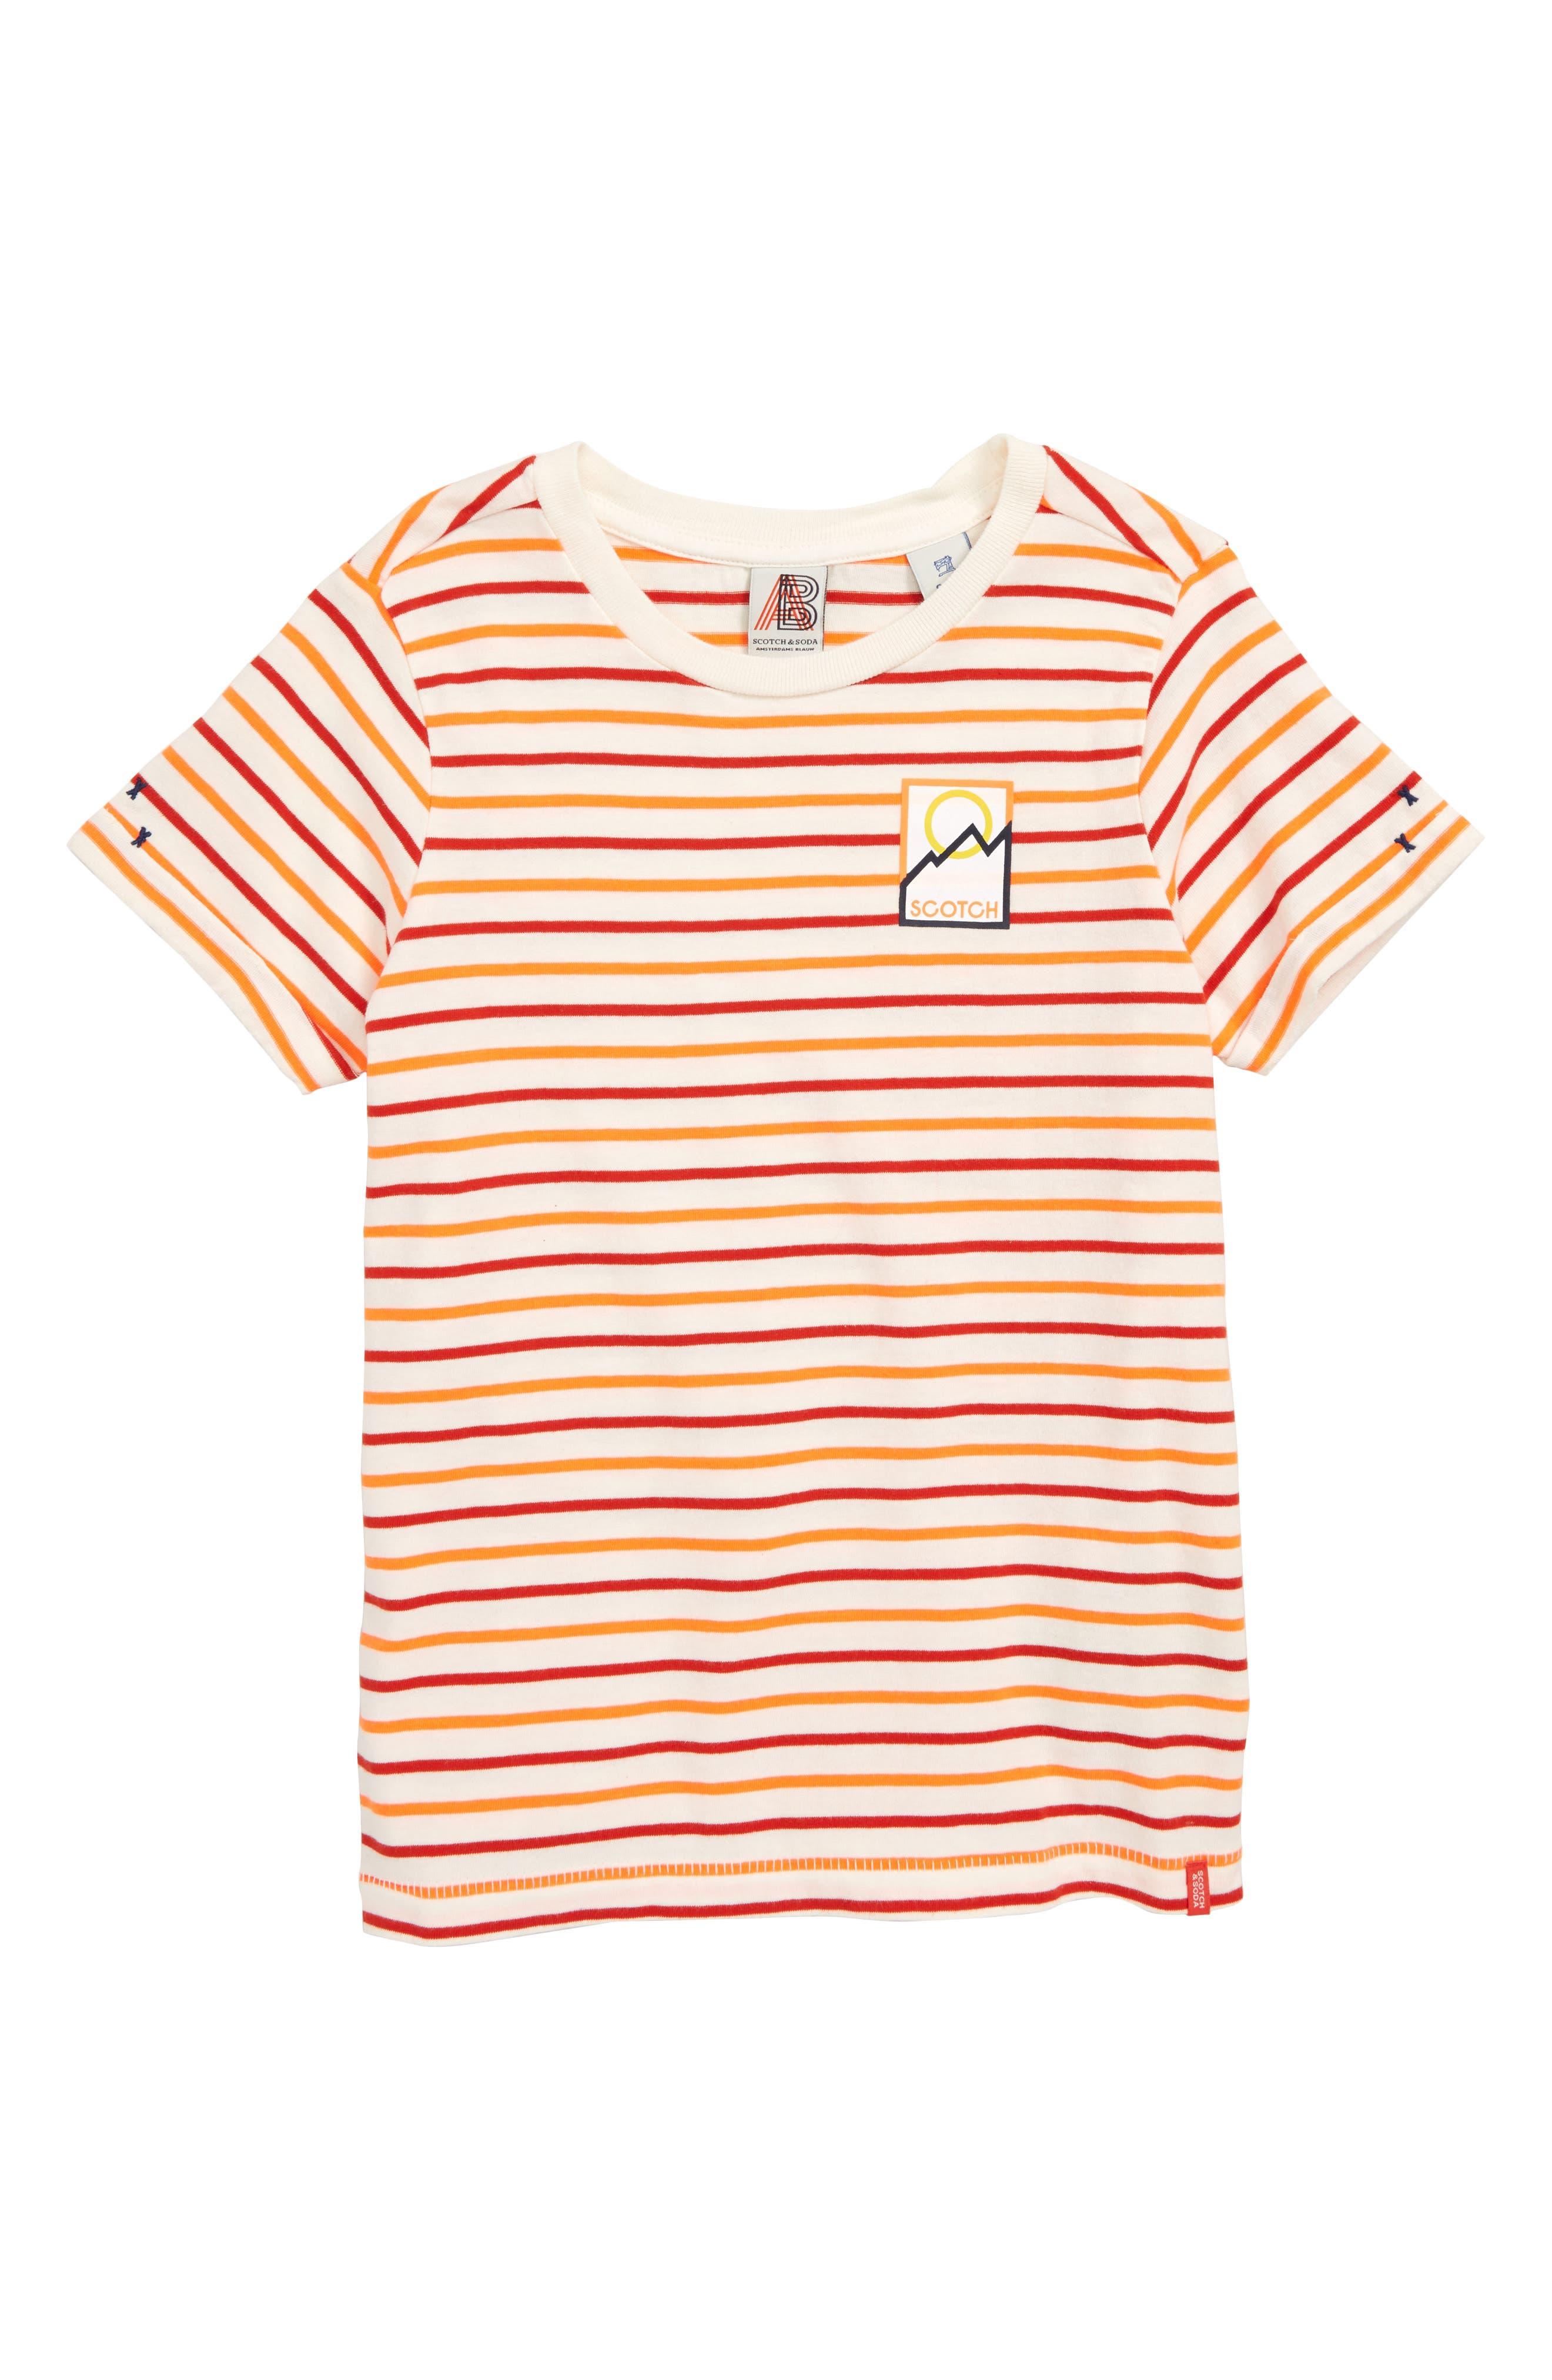 Regular Fit T-Shirt,                             Main thumbnail 1, color,                             ORANGE